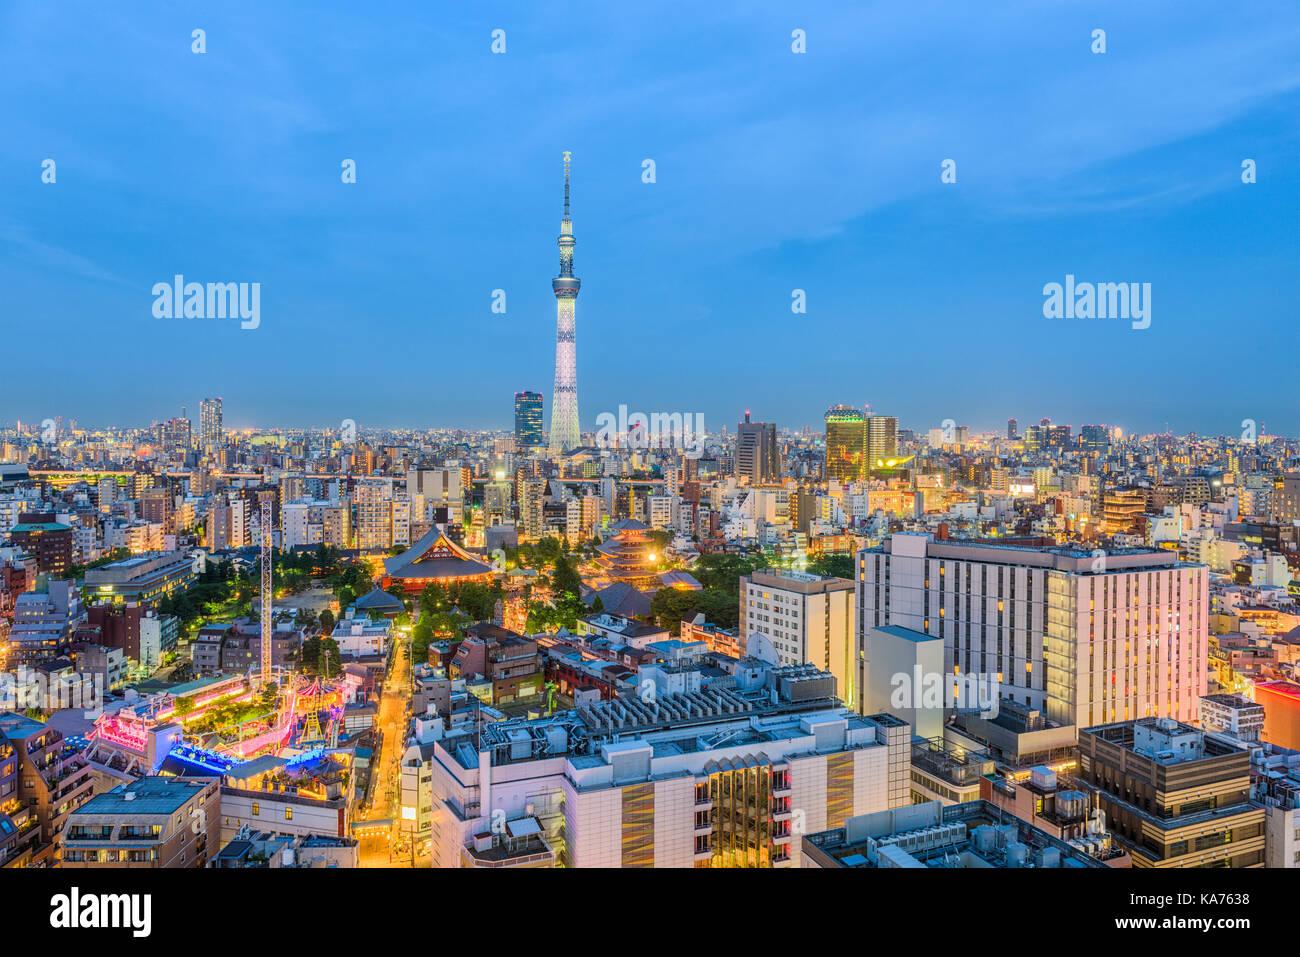 Tokyo, Japan skyline and tower. - Stock Image